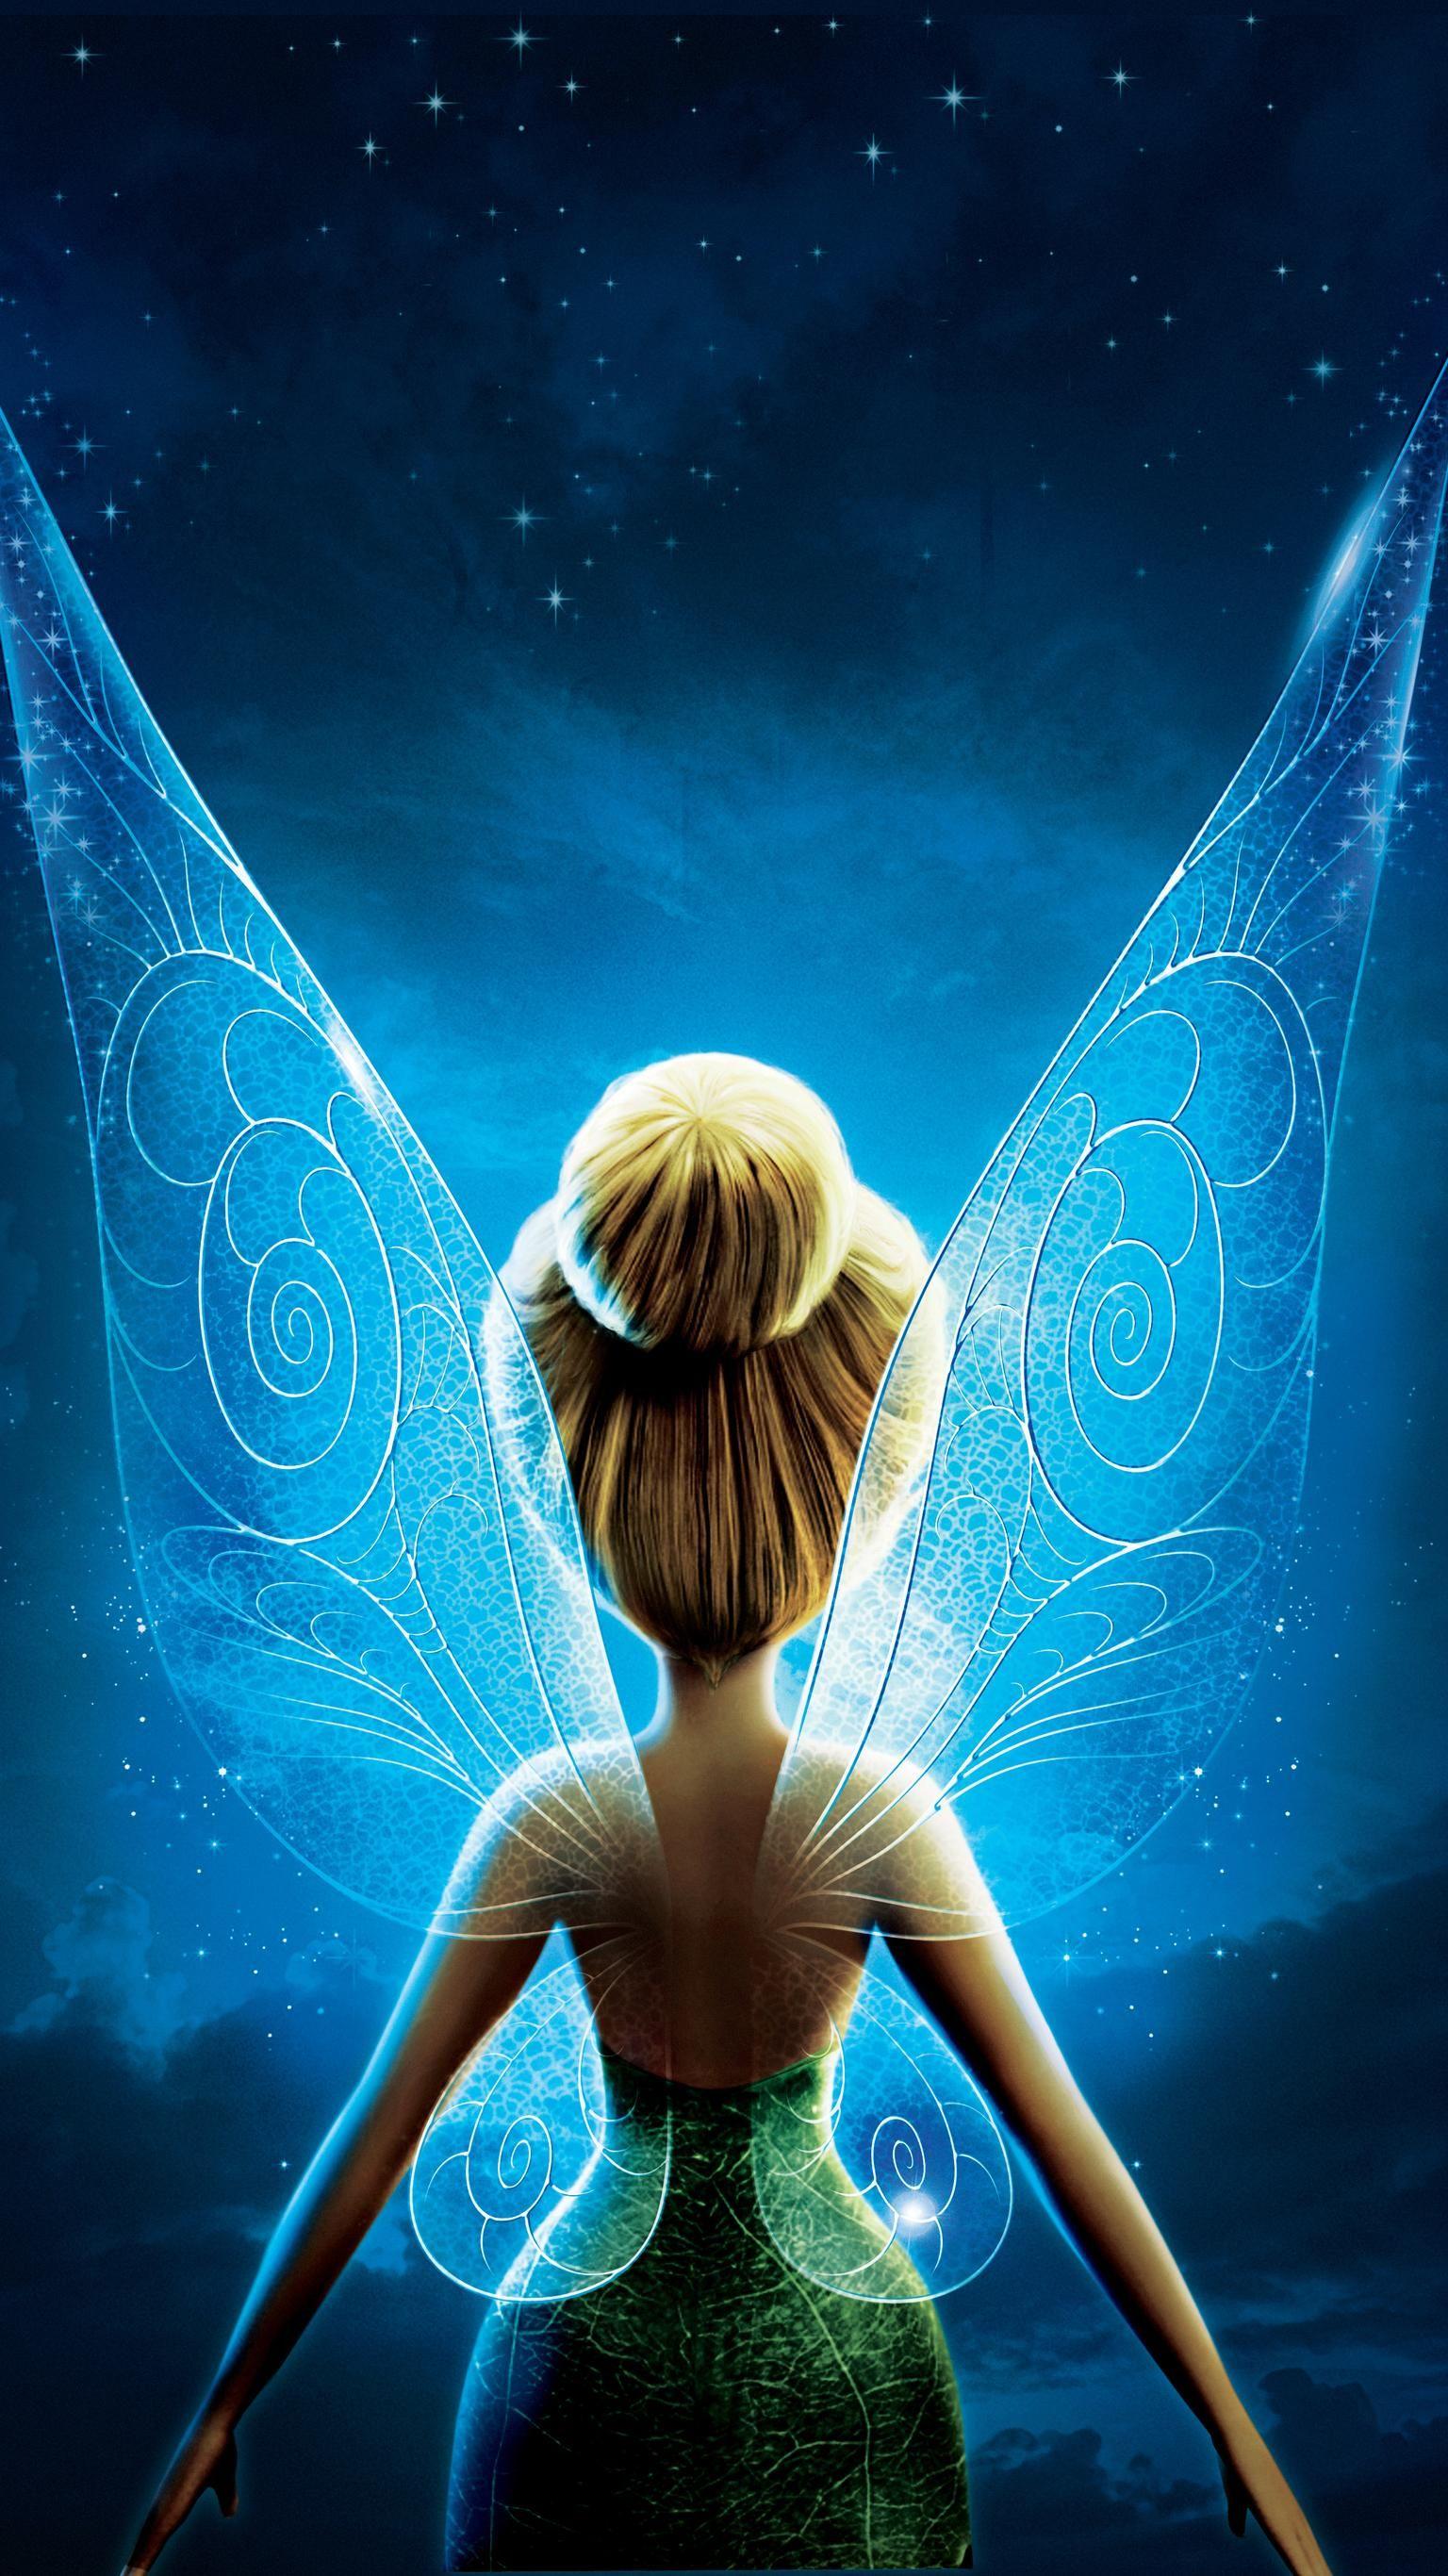 Secret of the Wings (2012) Phone Wallpaper #wallpaperforyourphone